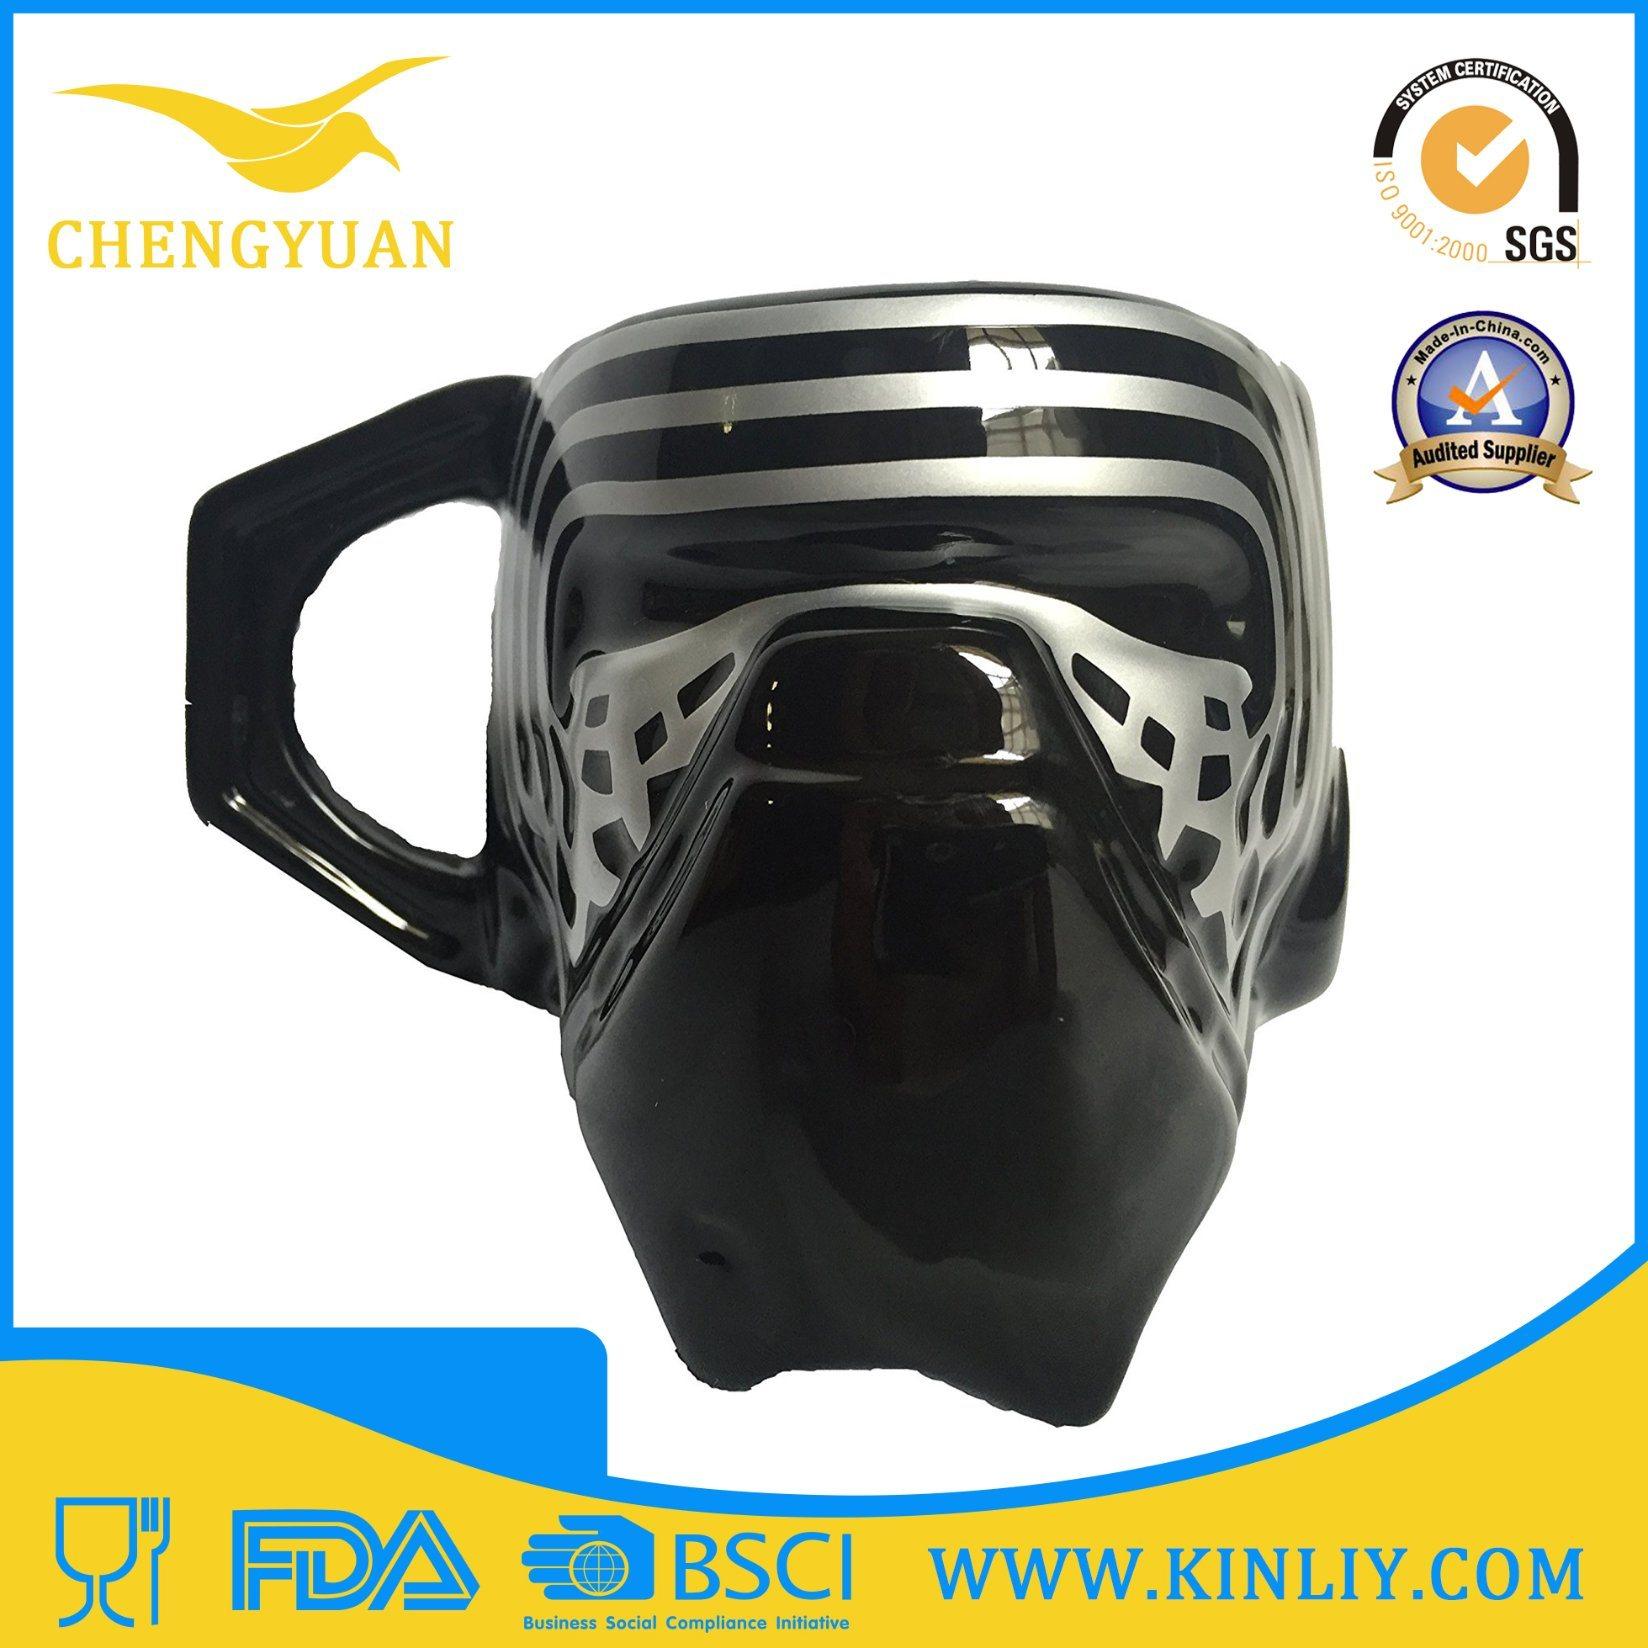 Hot Sale Ceramic Star Wars Tea Cup Coffee Mug for Cheap